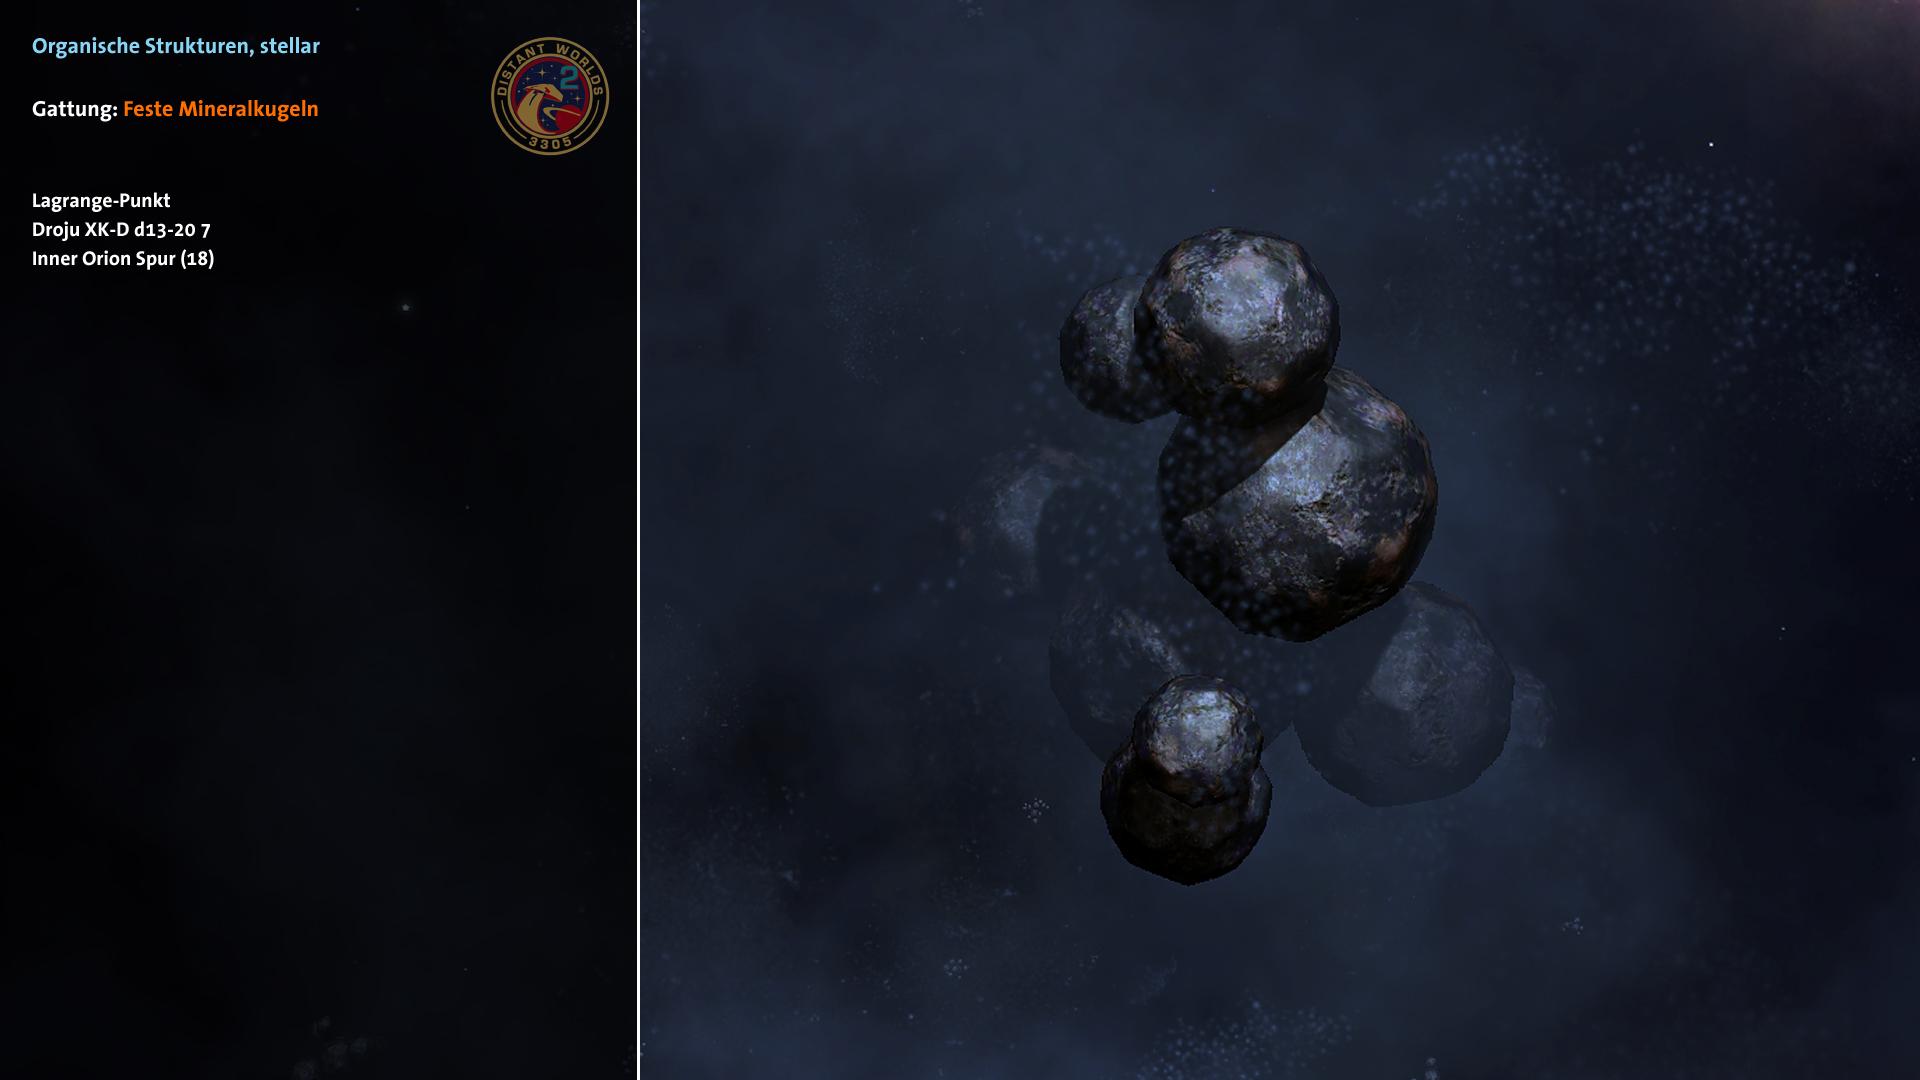 dw2-01-014-biostellar.jpg